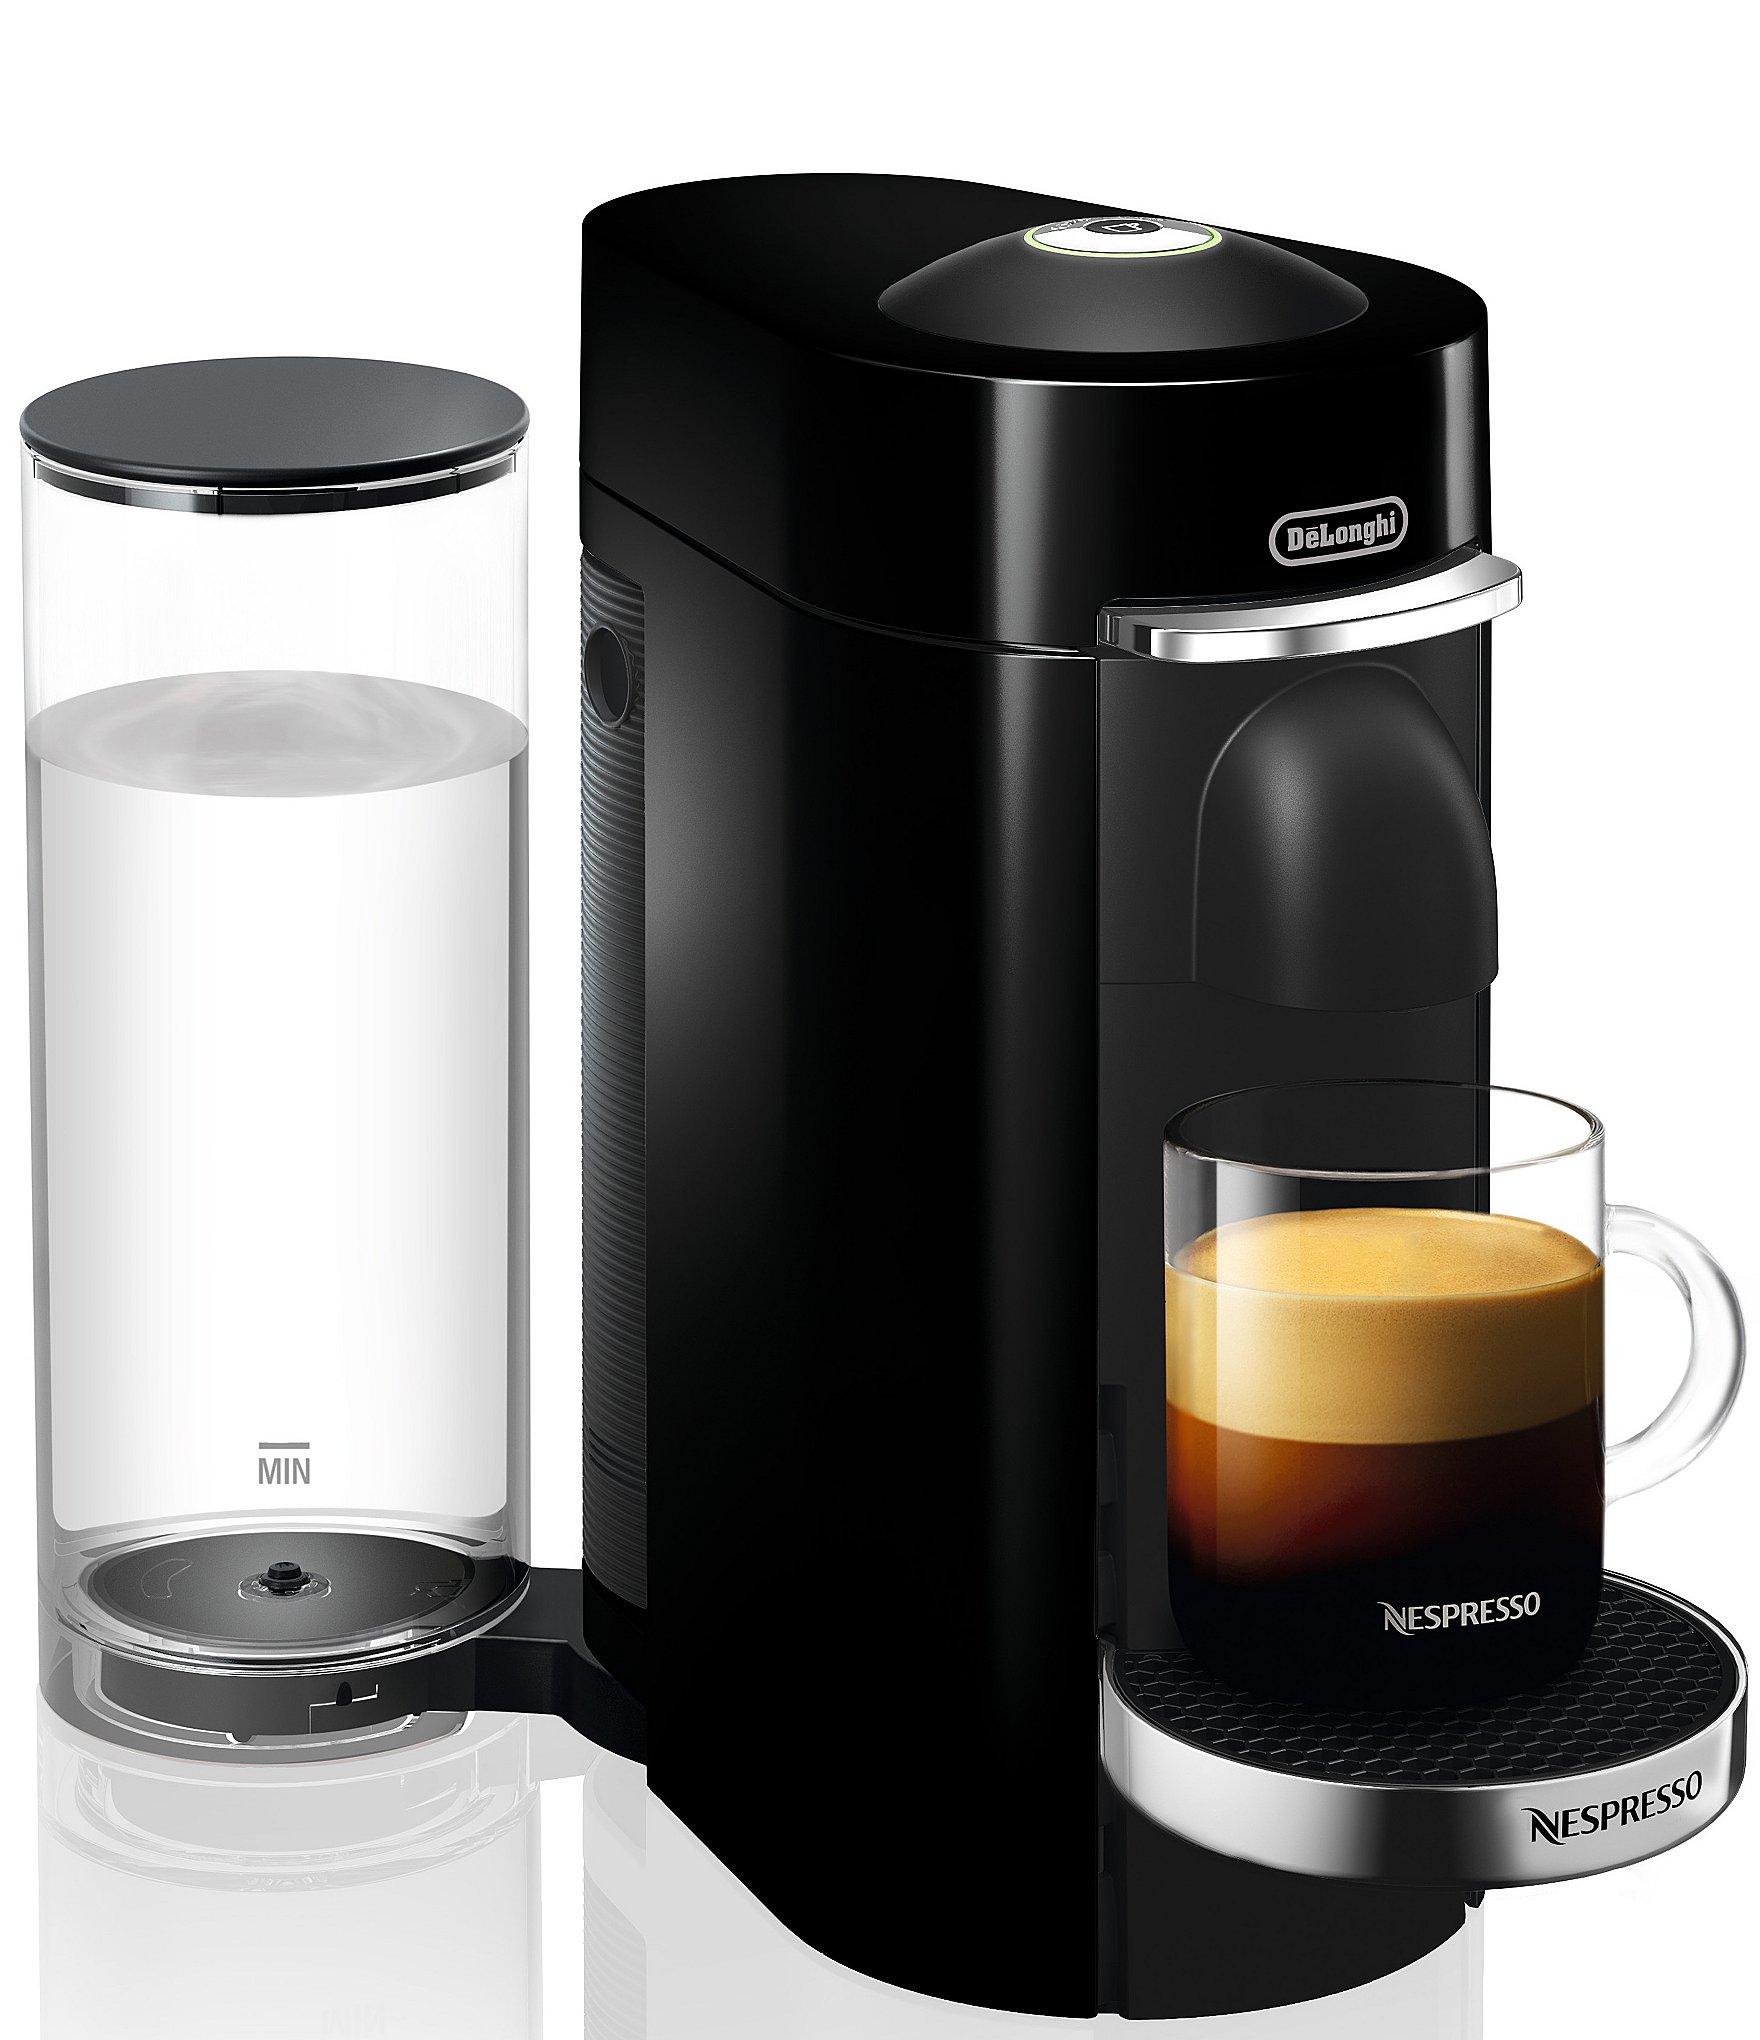 nespresso by delonghi vertuoplus deluxe coffee espresso maker dillards. Black Bedroom Furniture Sets. Home Design Ideas